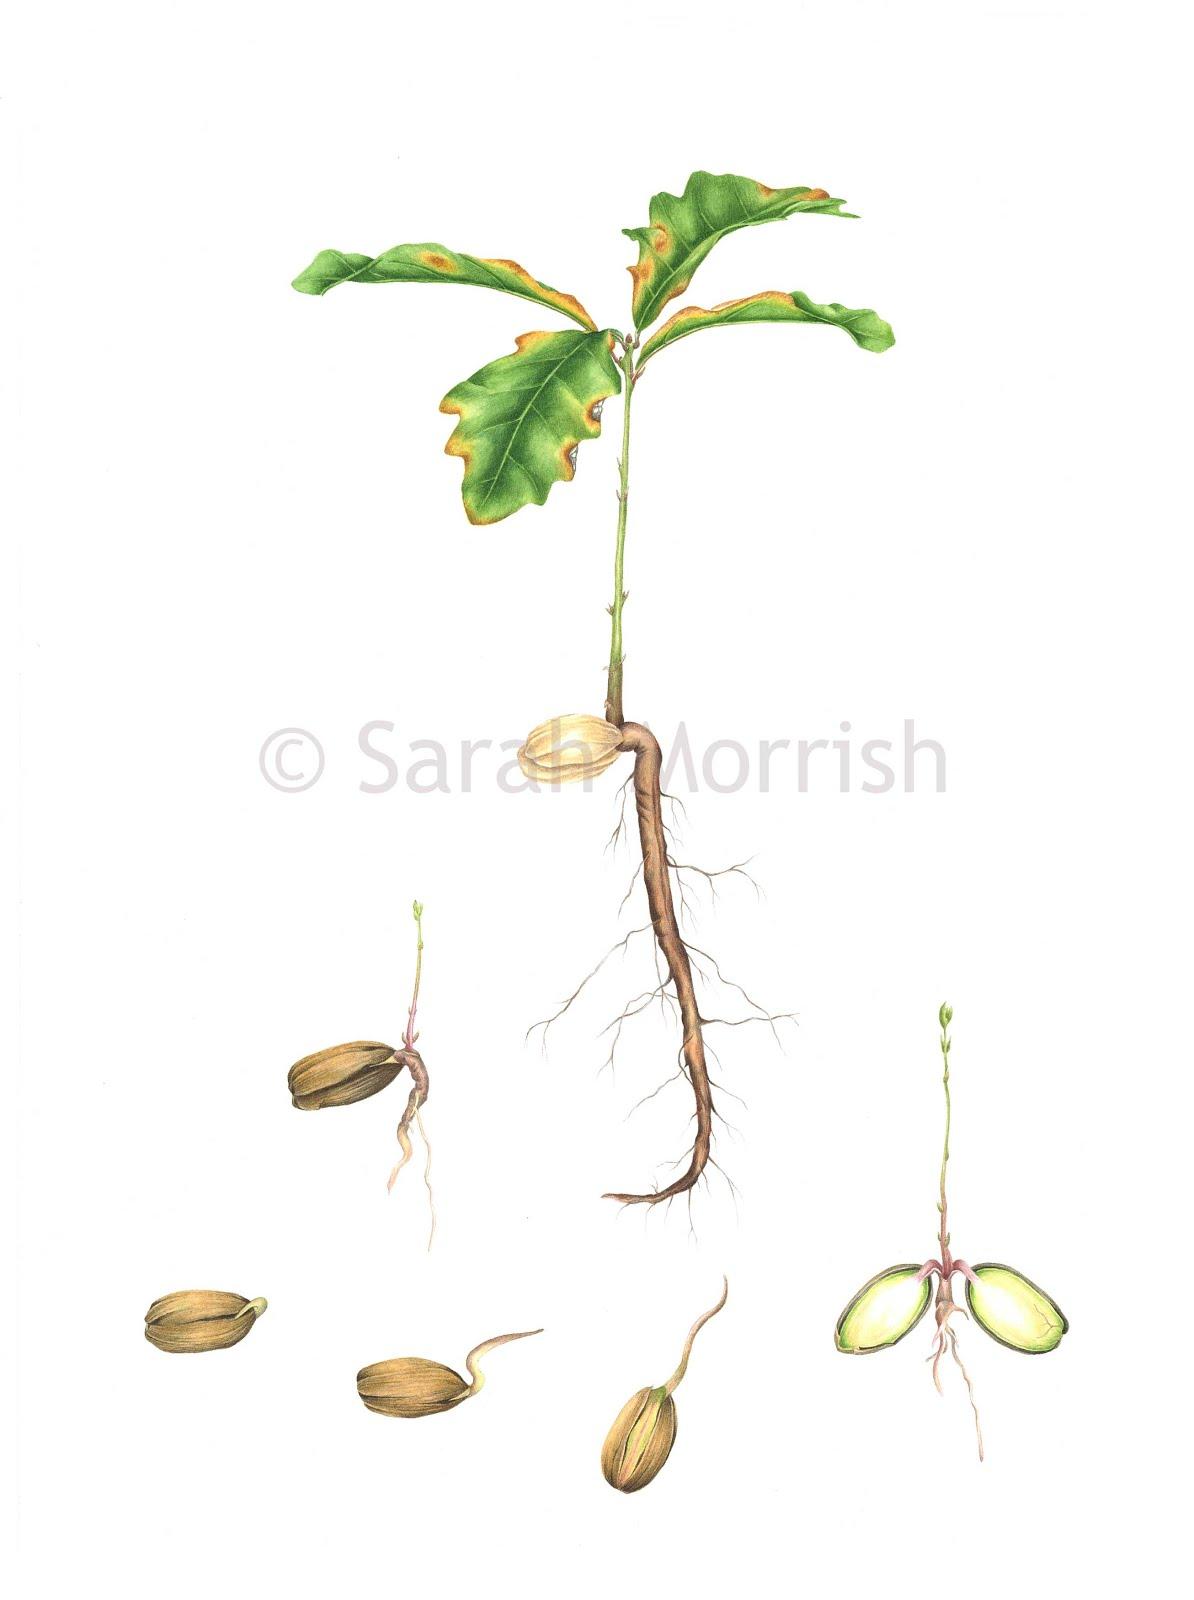 Quercus robur - New life